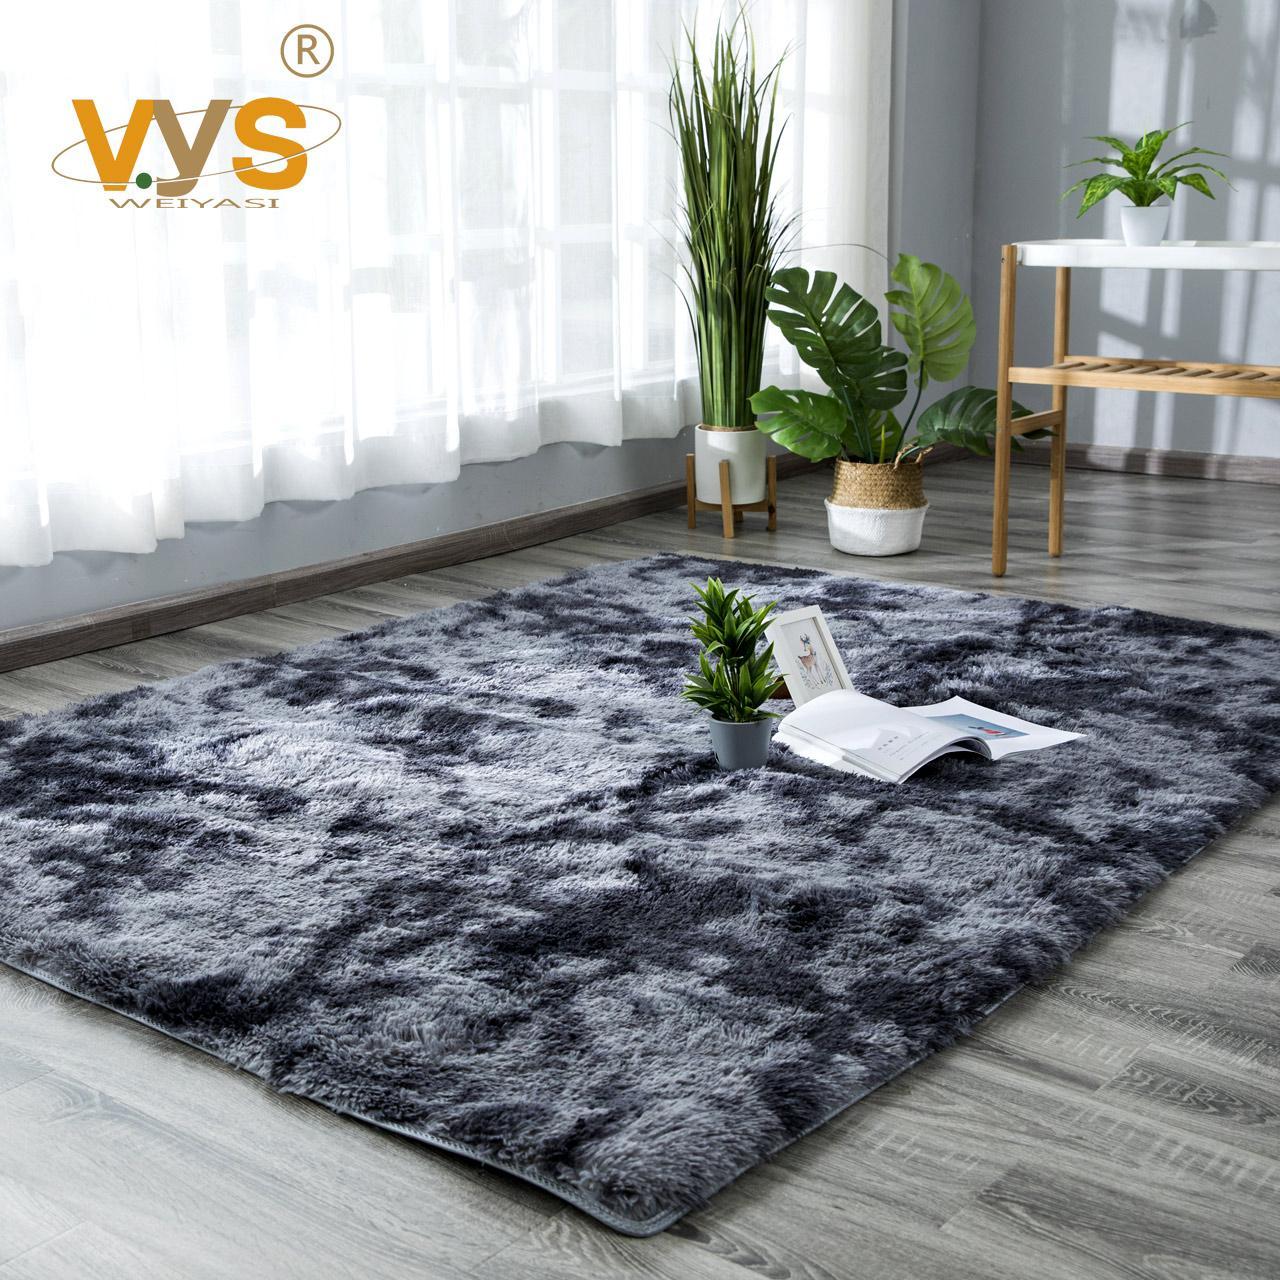 Living Room Rug Northern Europe Modern Minimalist Sofa Table Carpet American Geometry fang zhang Nap Bedside Bedroom Big Rug